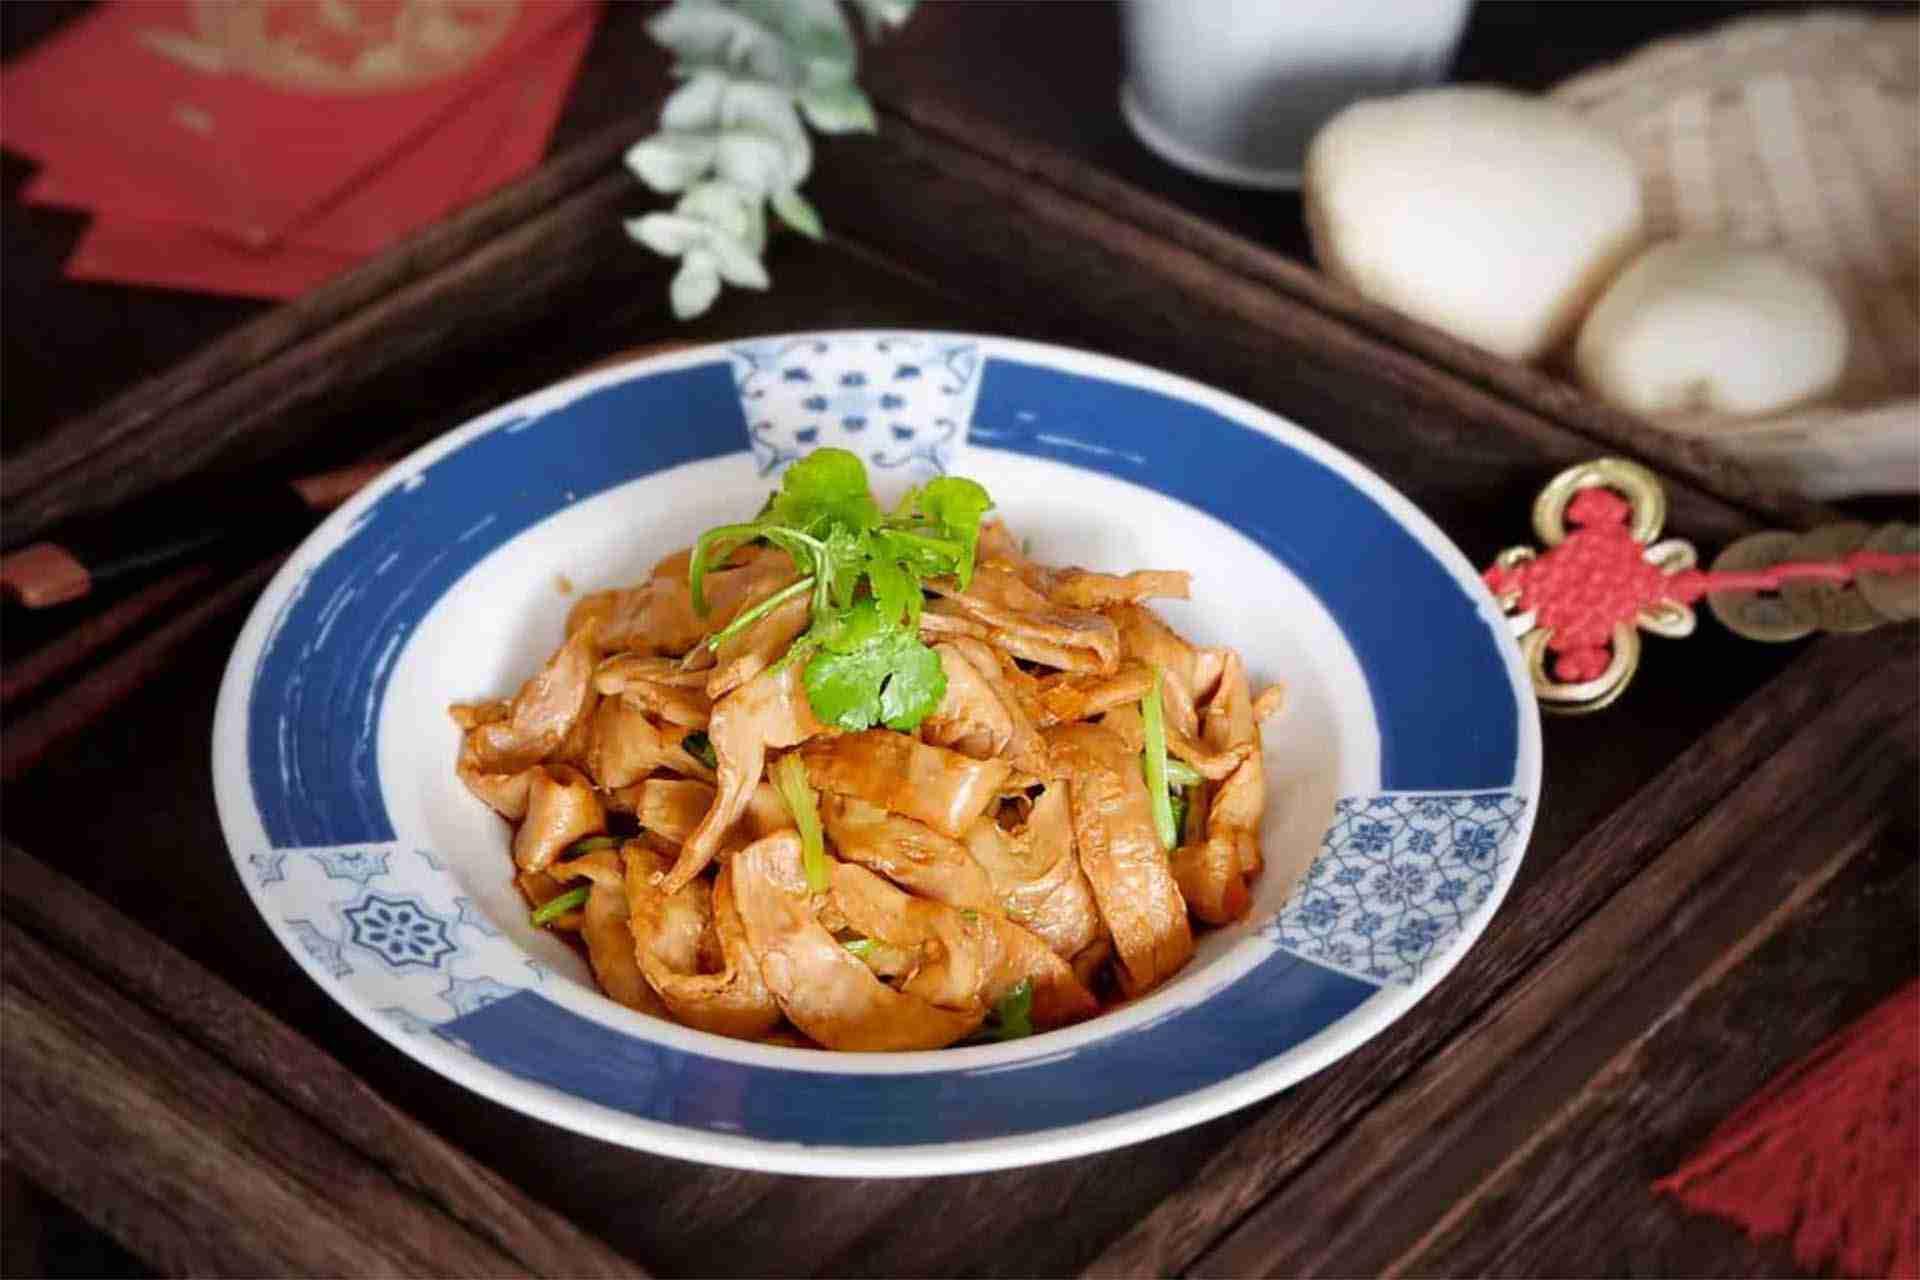 Stir-fried Vegetarian meat with Cilantro